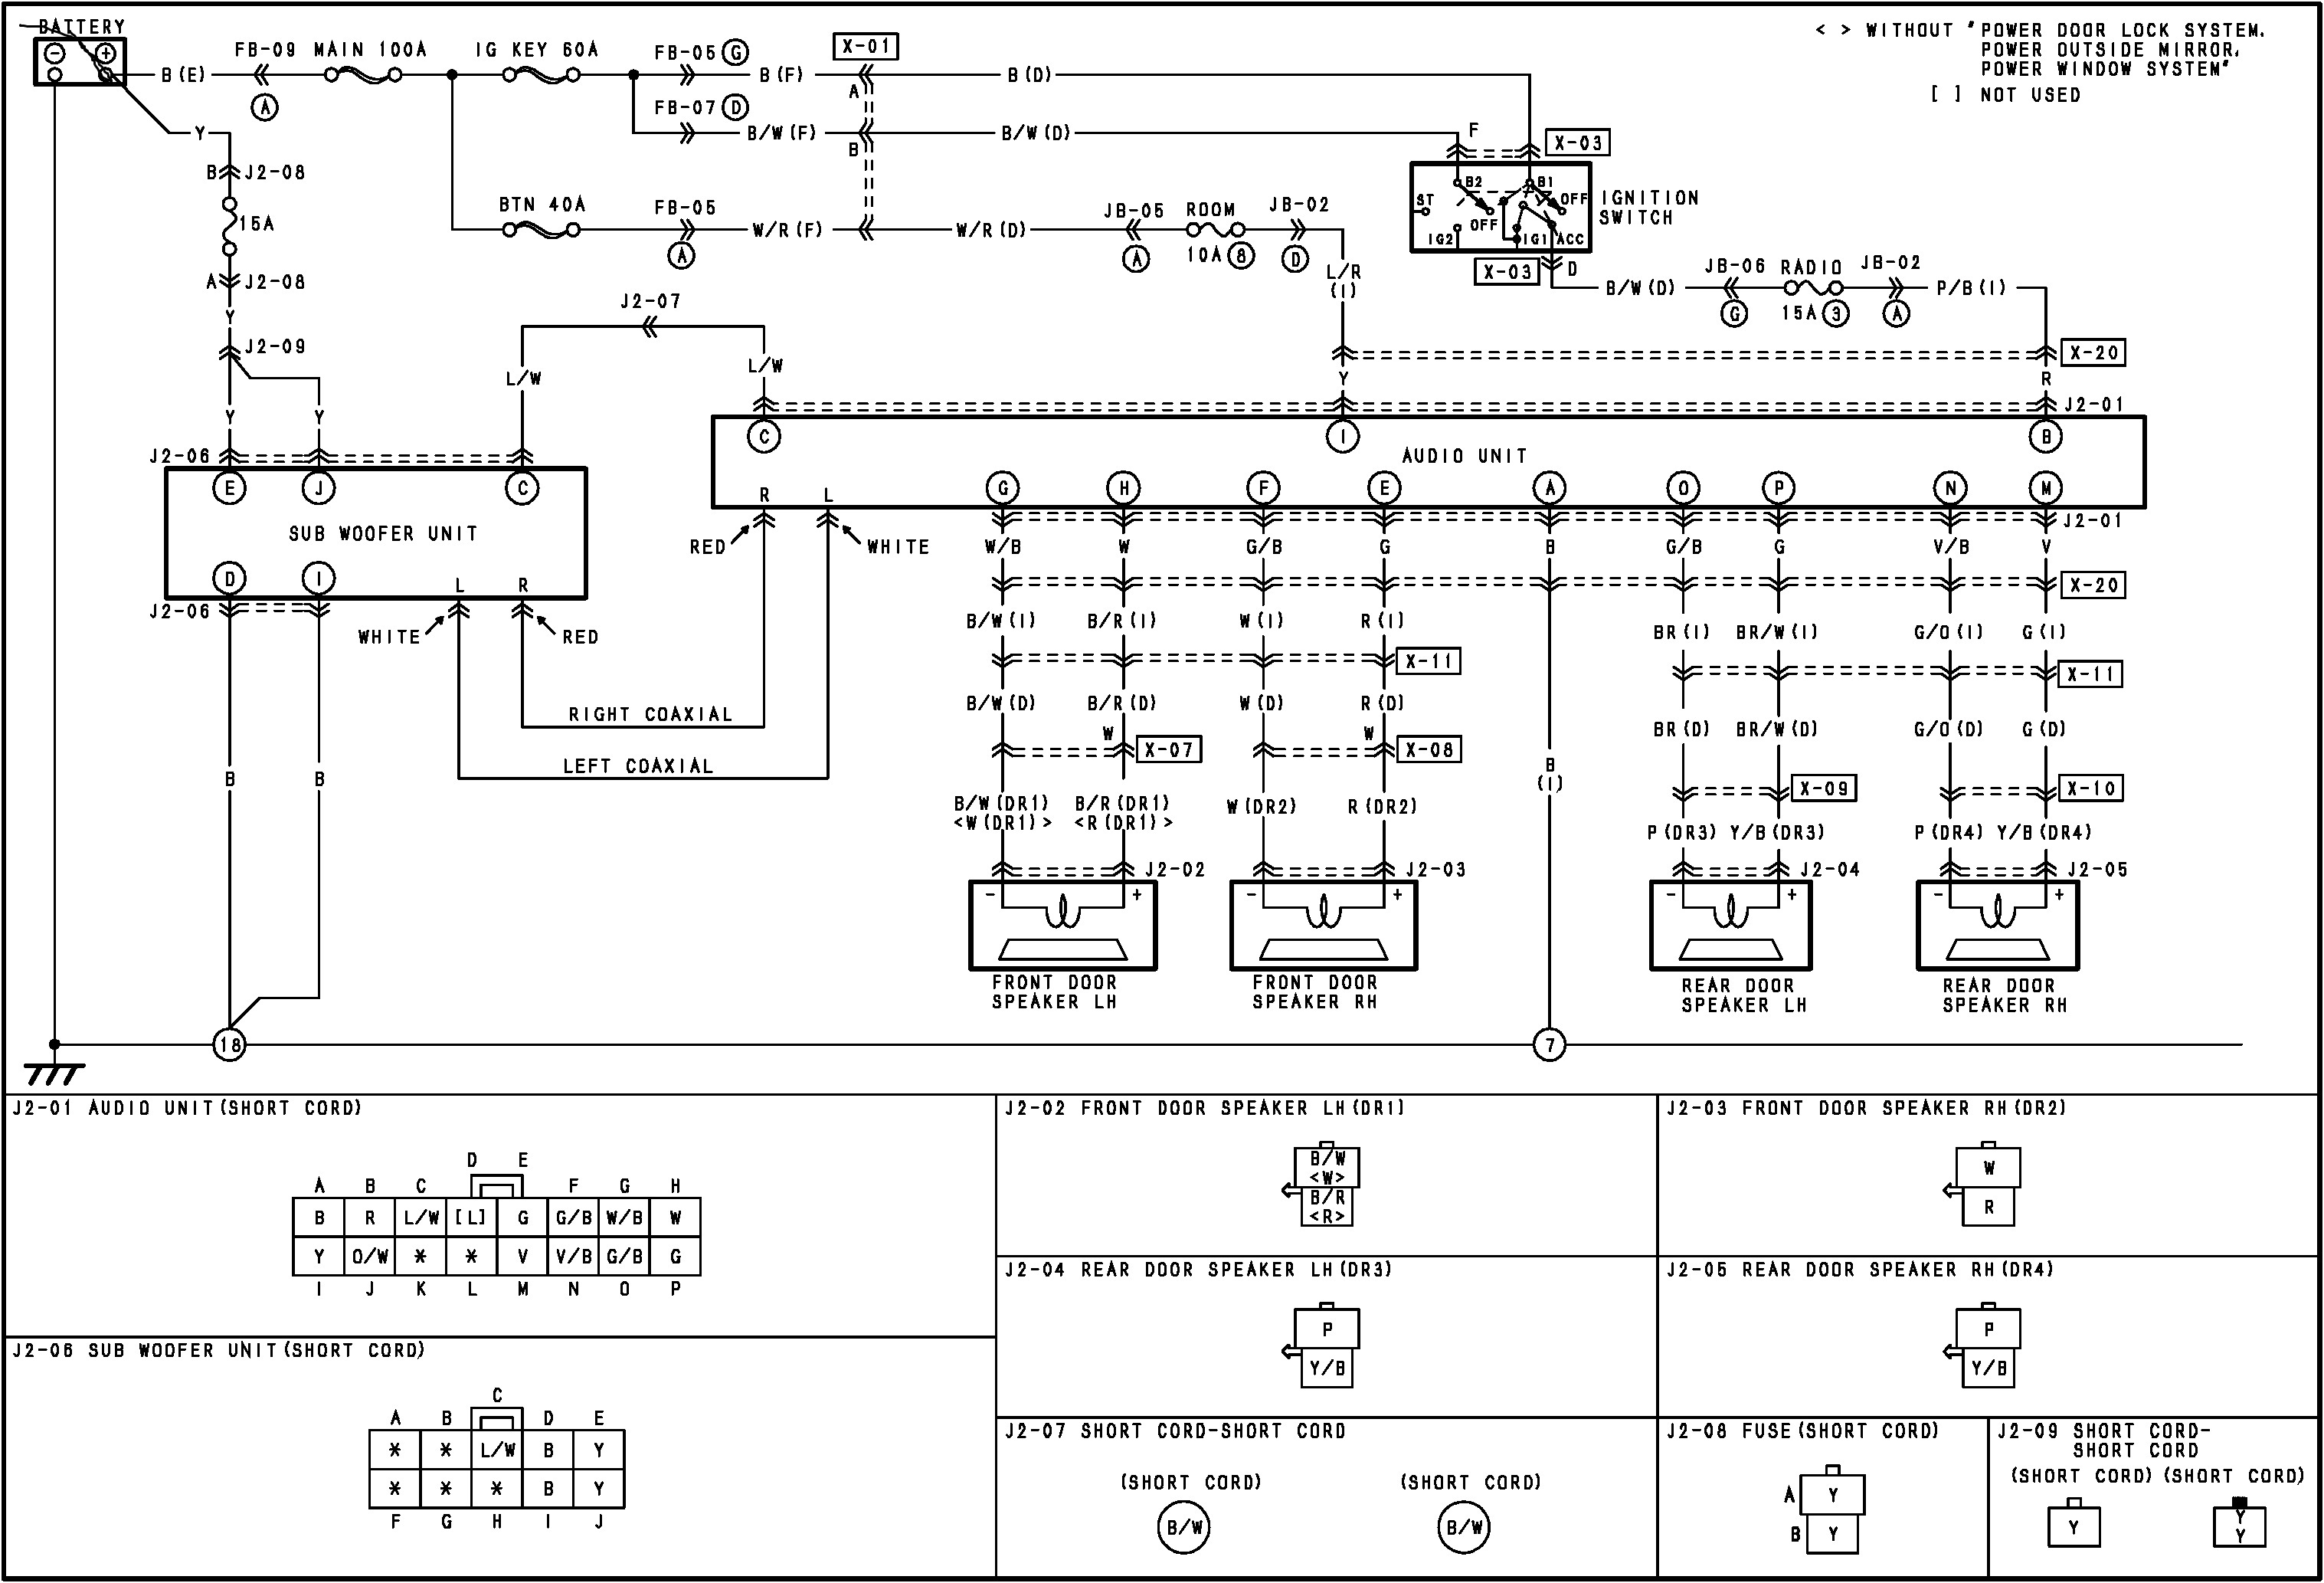 mazda tribute door wiring diagram power wheels electrical wiring, Wiring diagram